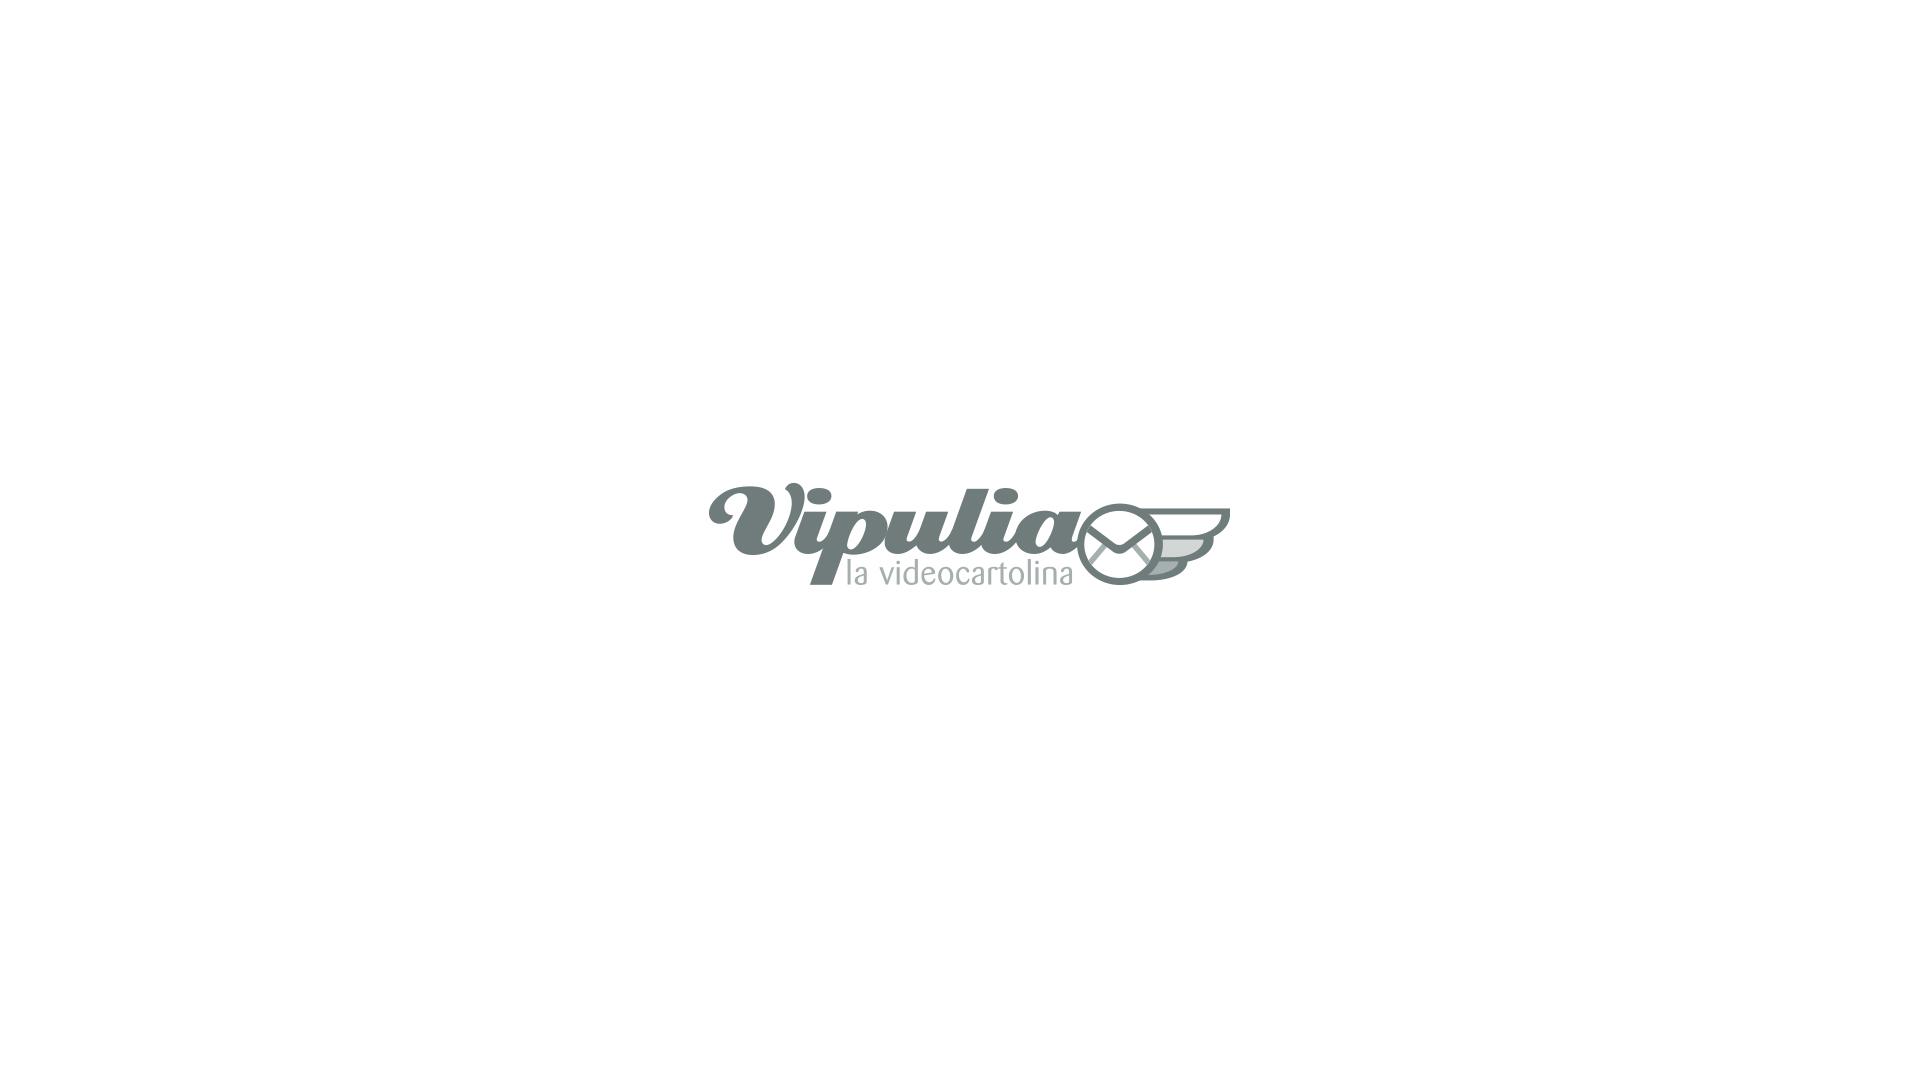 002_vipulia